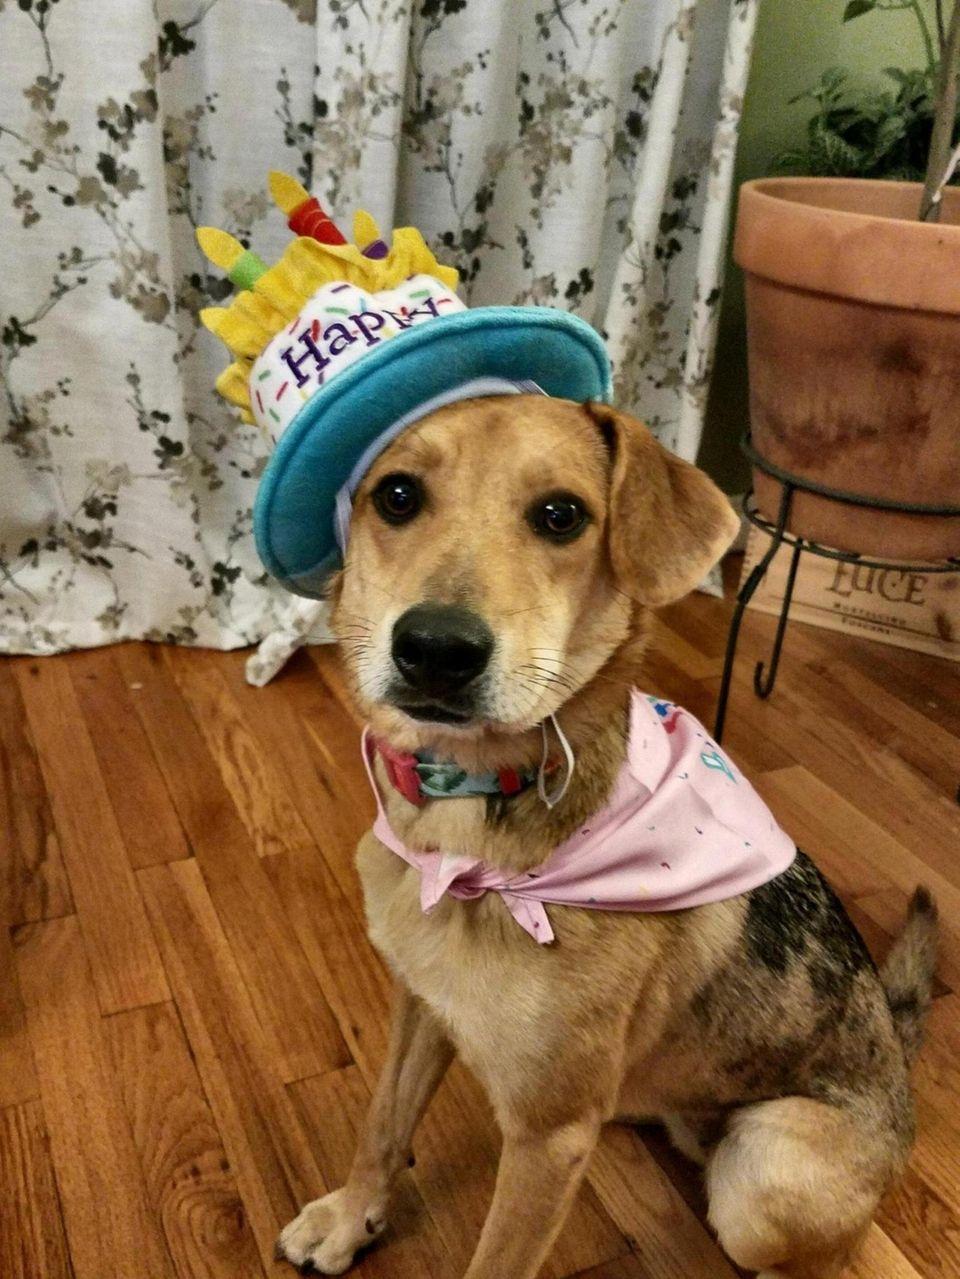 Happy 1st Birthday Lacie!